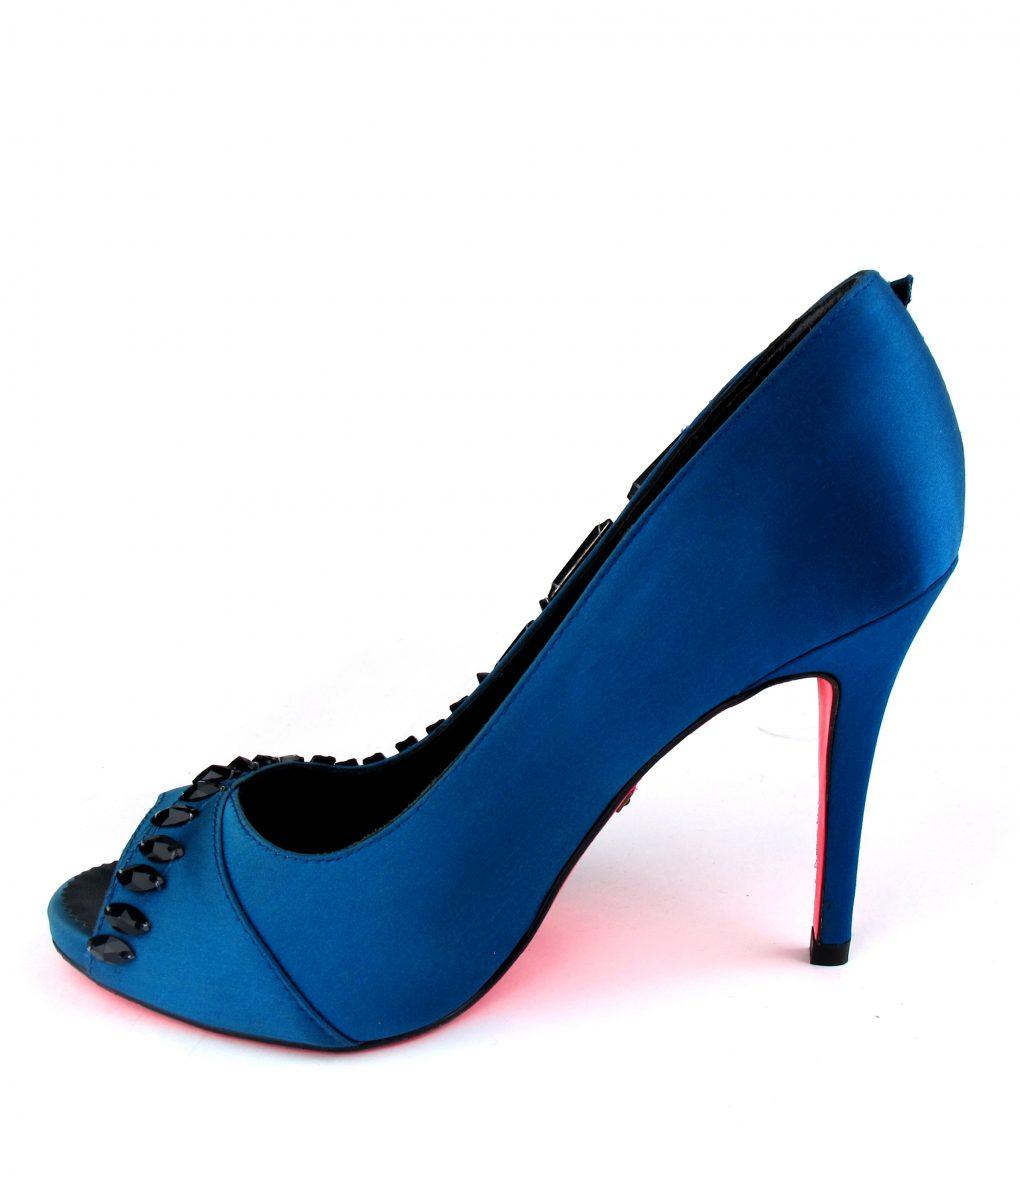 Suecomma Bonnie Teal & Black Crystal open toe heels